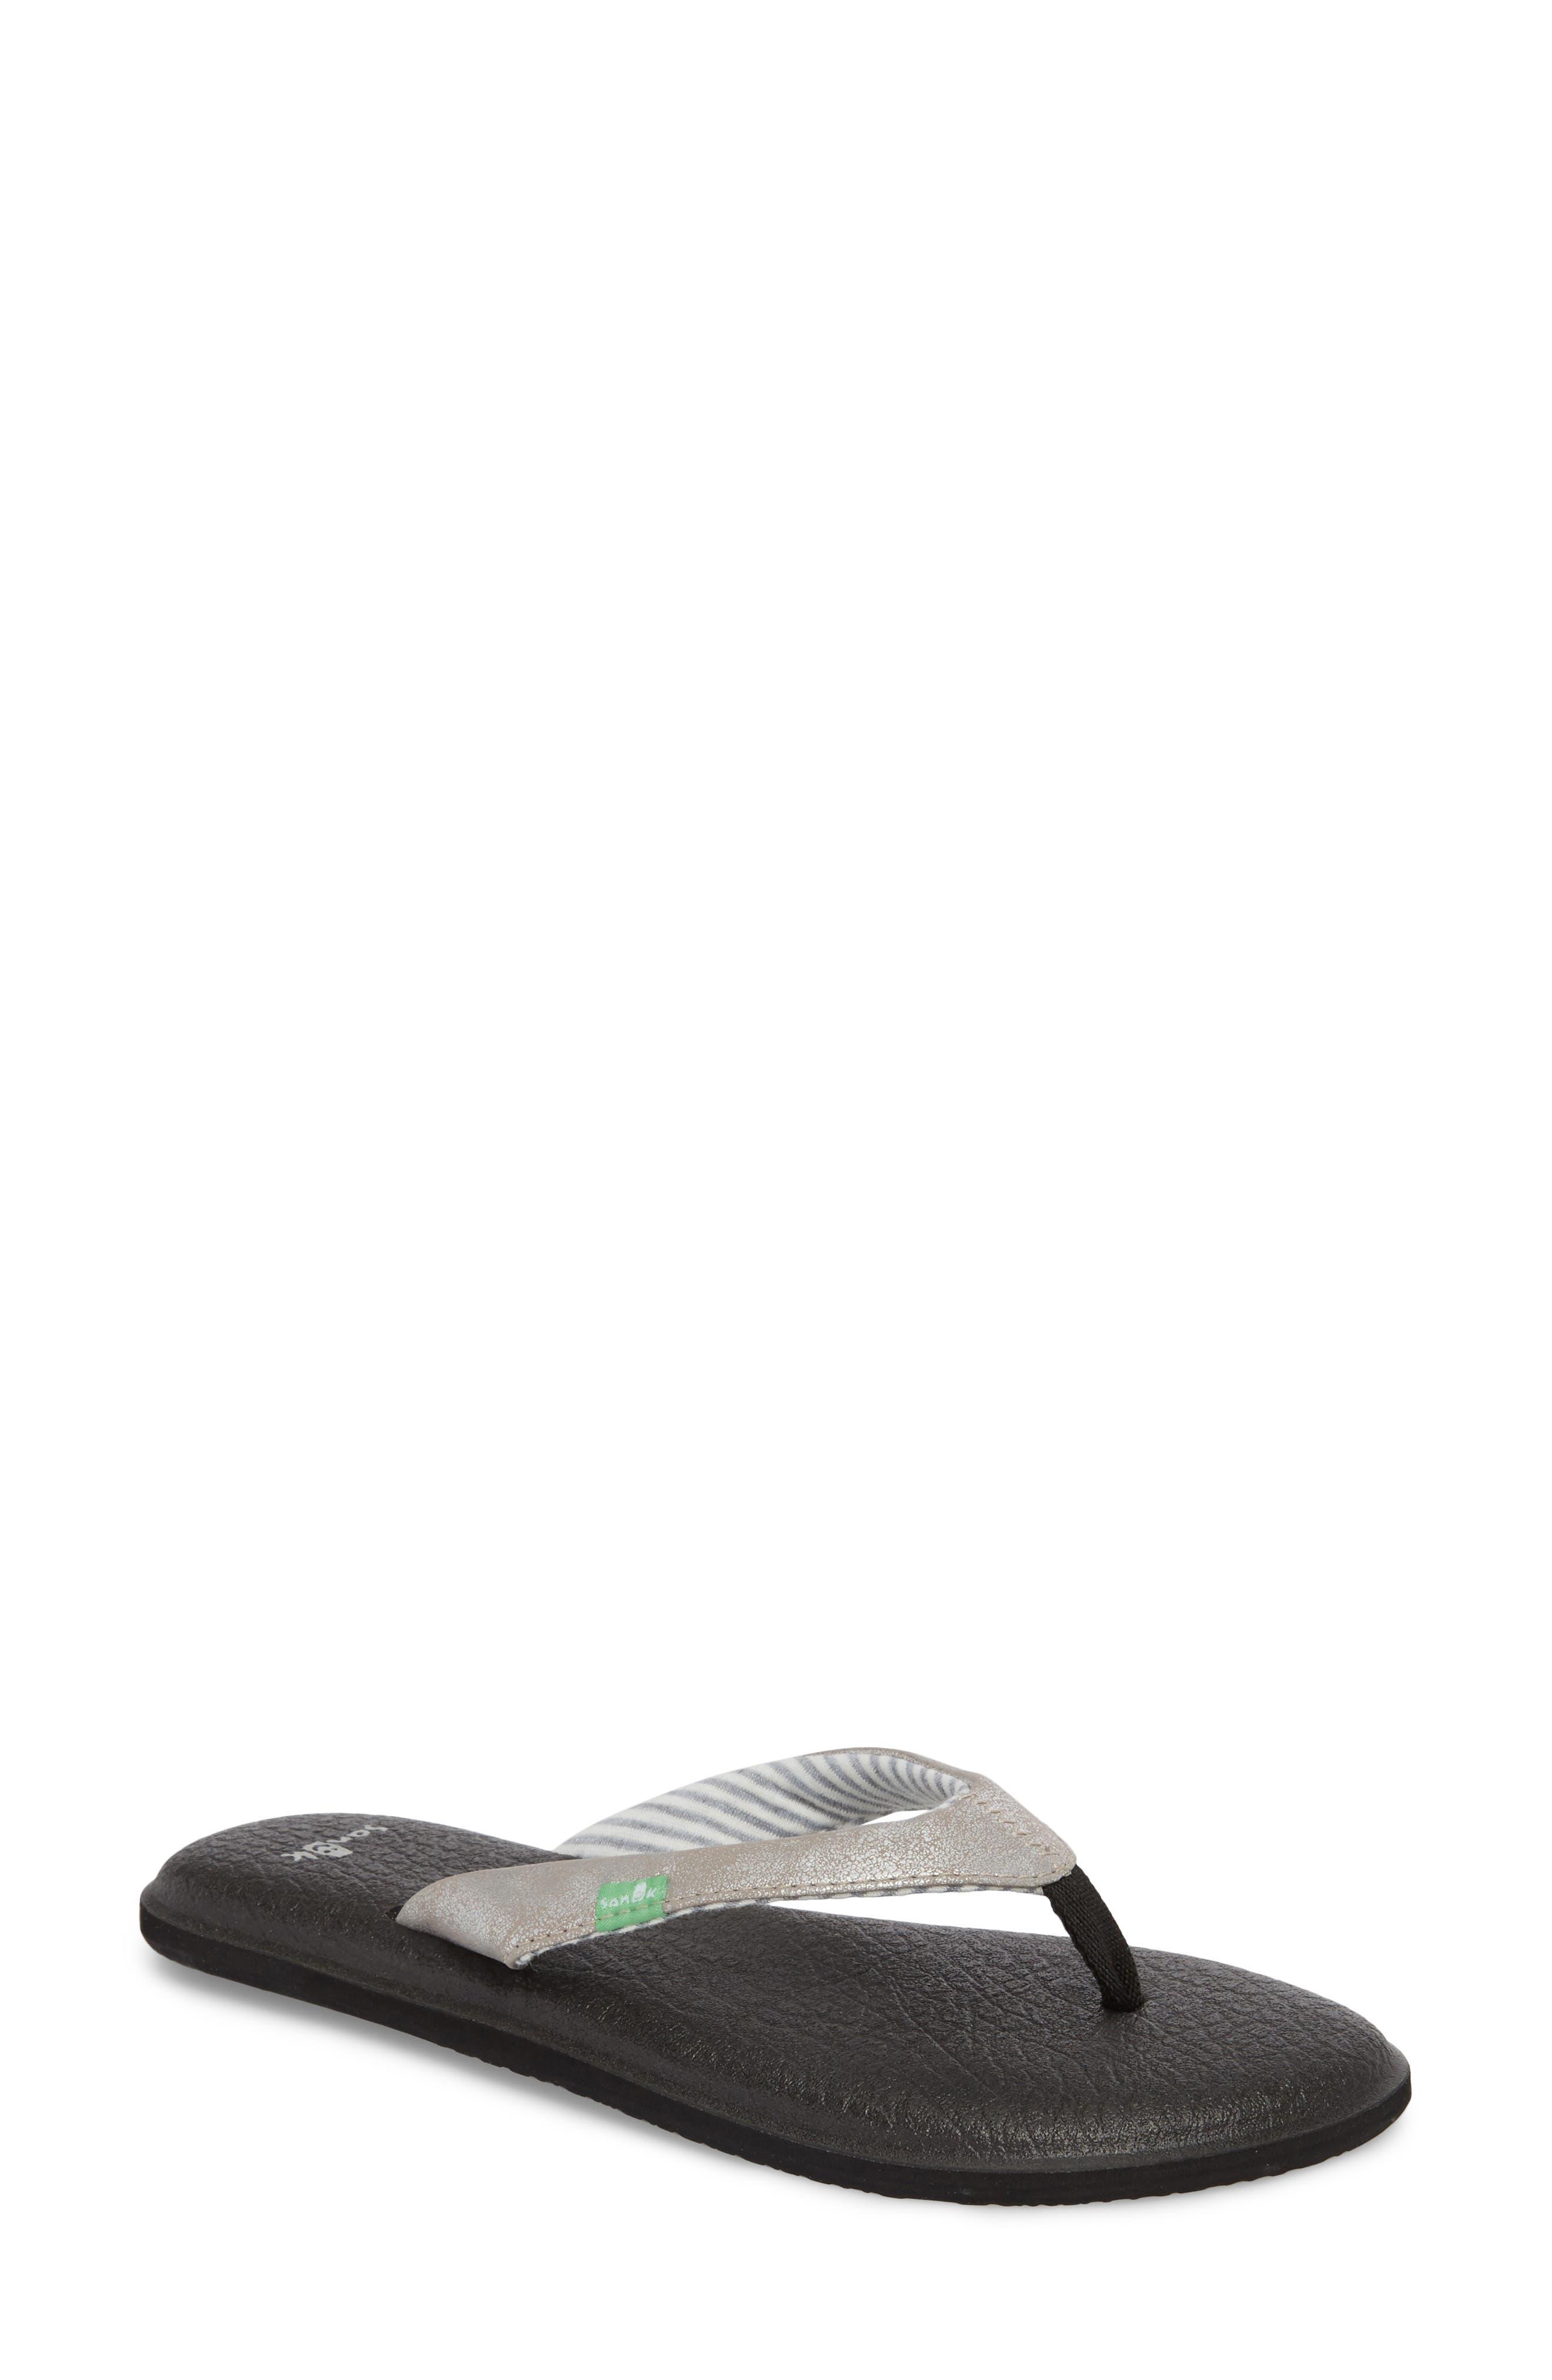 'Yoga Chakra' Flip Flop,                         Main,                         color, 040